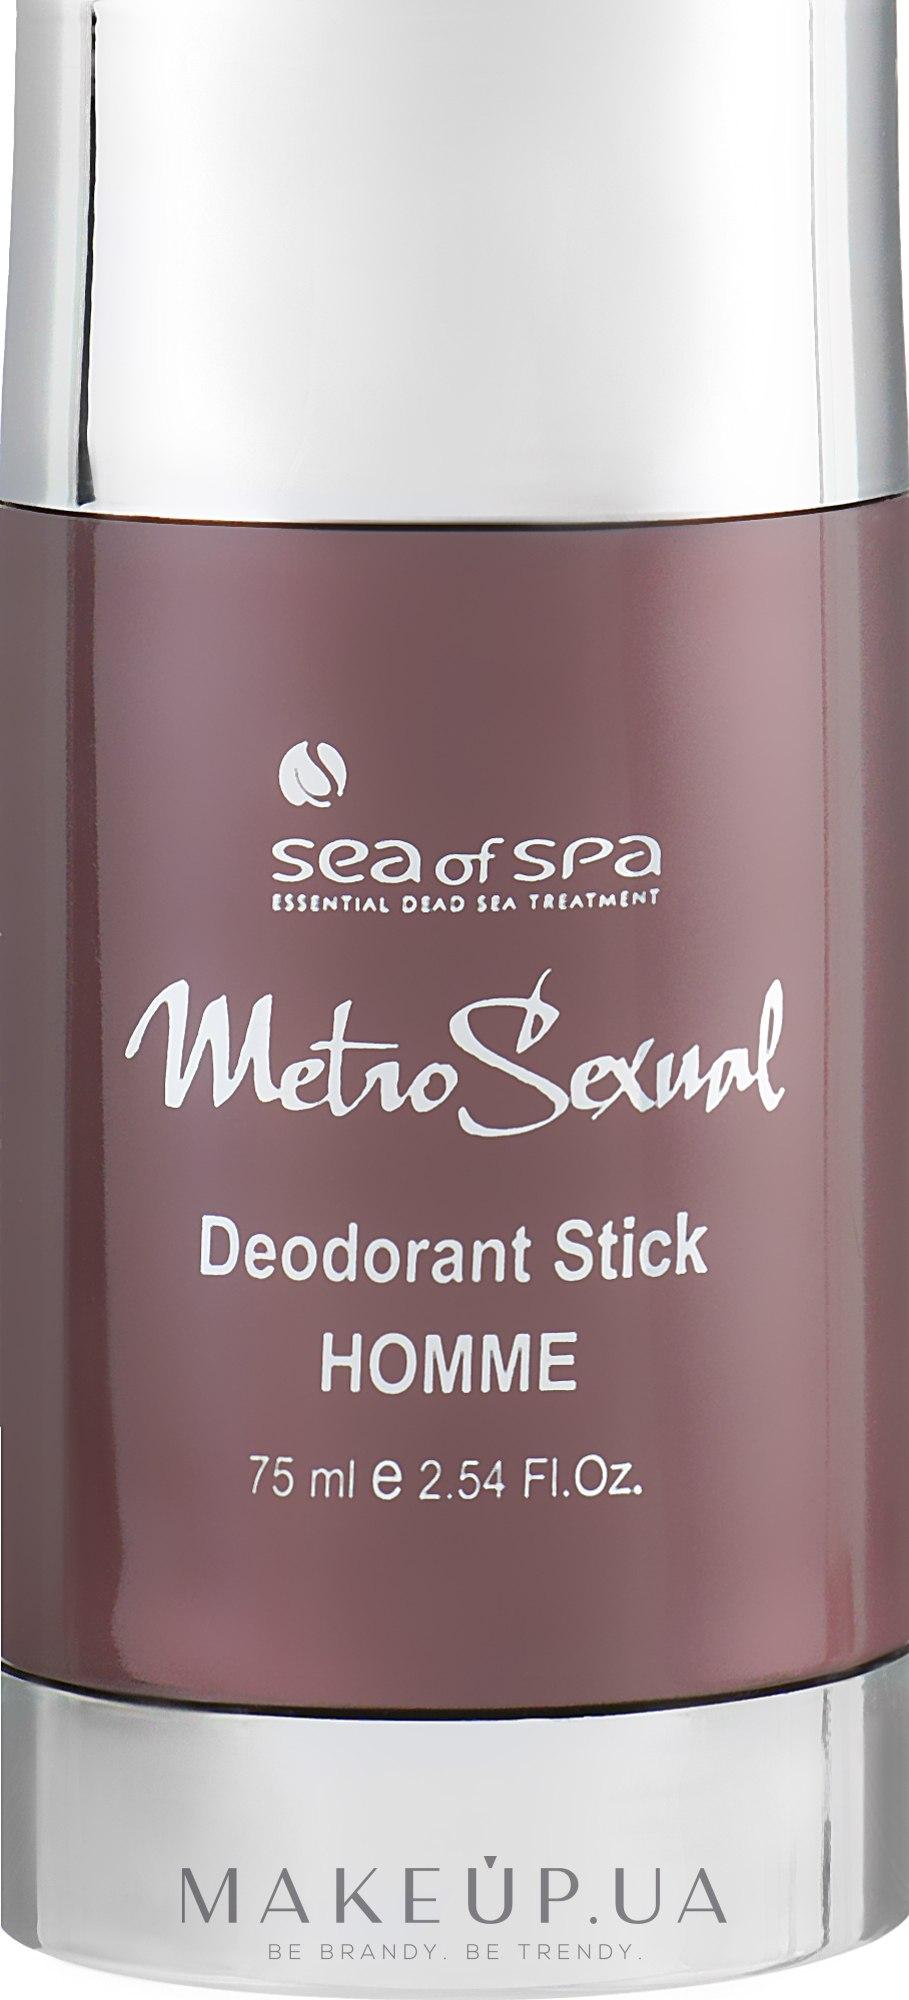 Дезодорант-стік - Sea Of Spa MetroSexual Bio-Mimetic Deodorant Stick Homme — фото 75ml